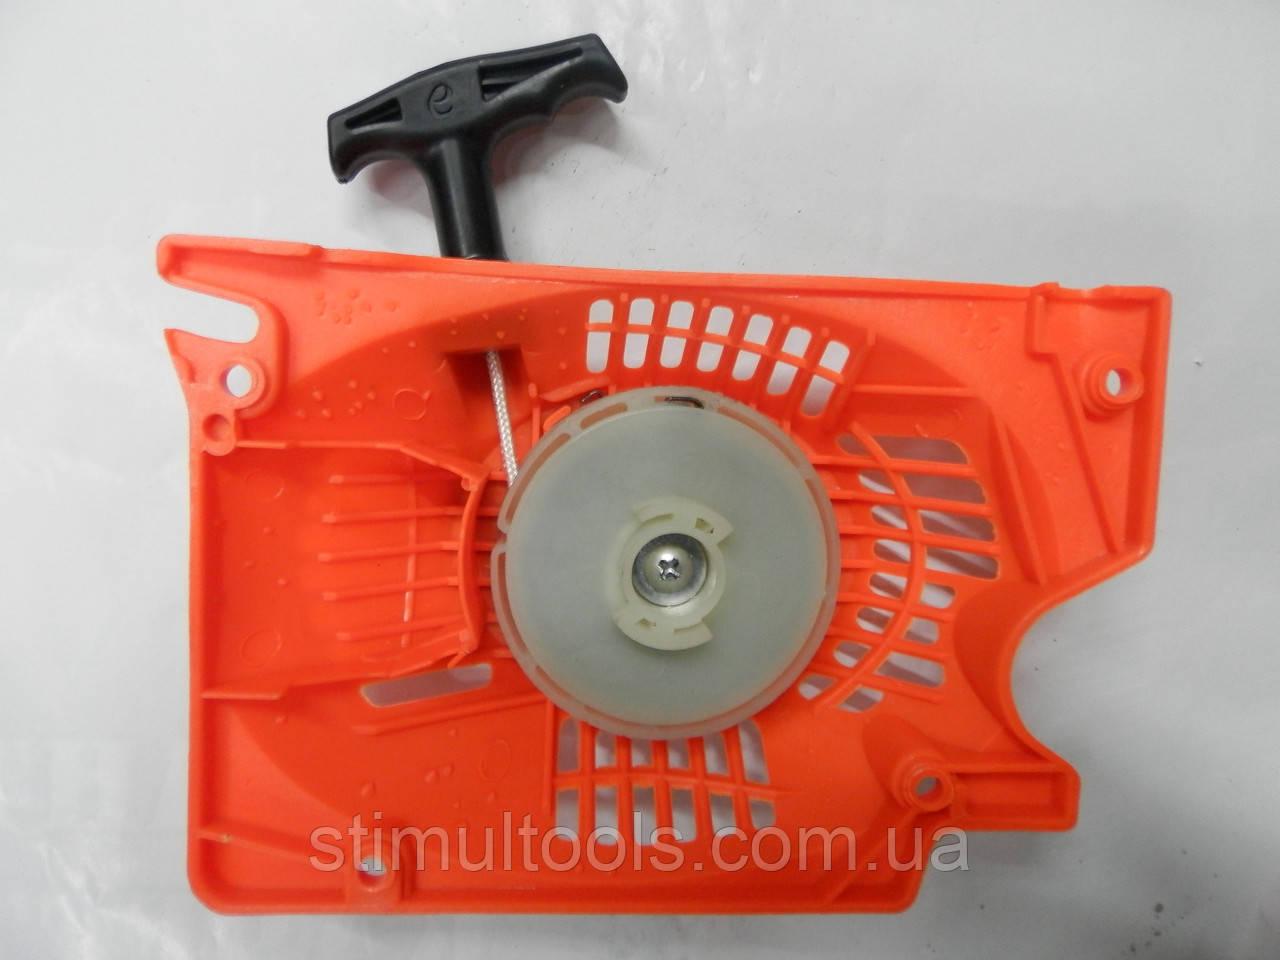 Стартер для бензопилы GL 4500/5200, 2 лепестка